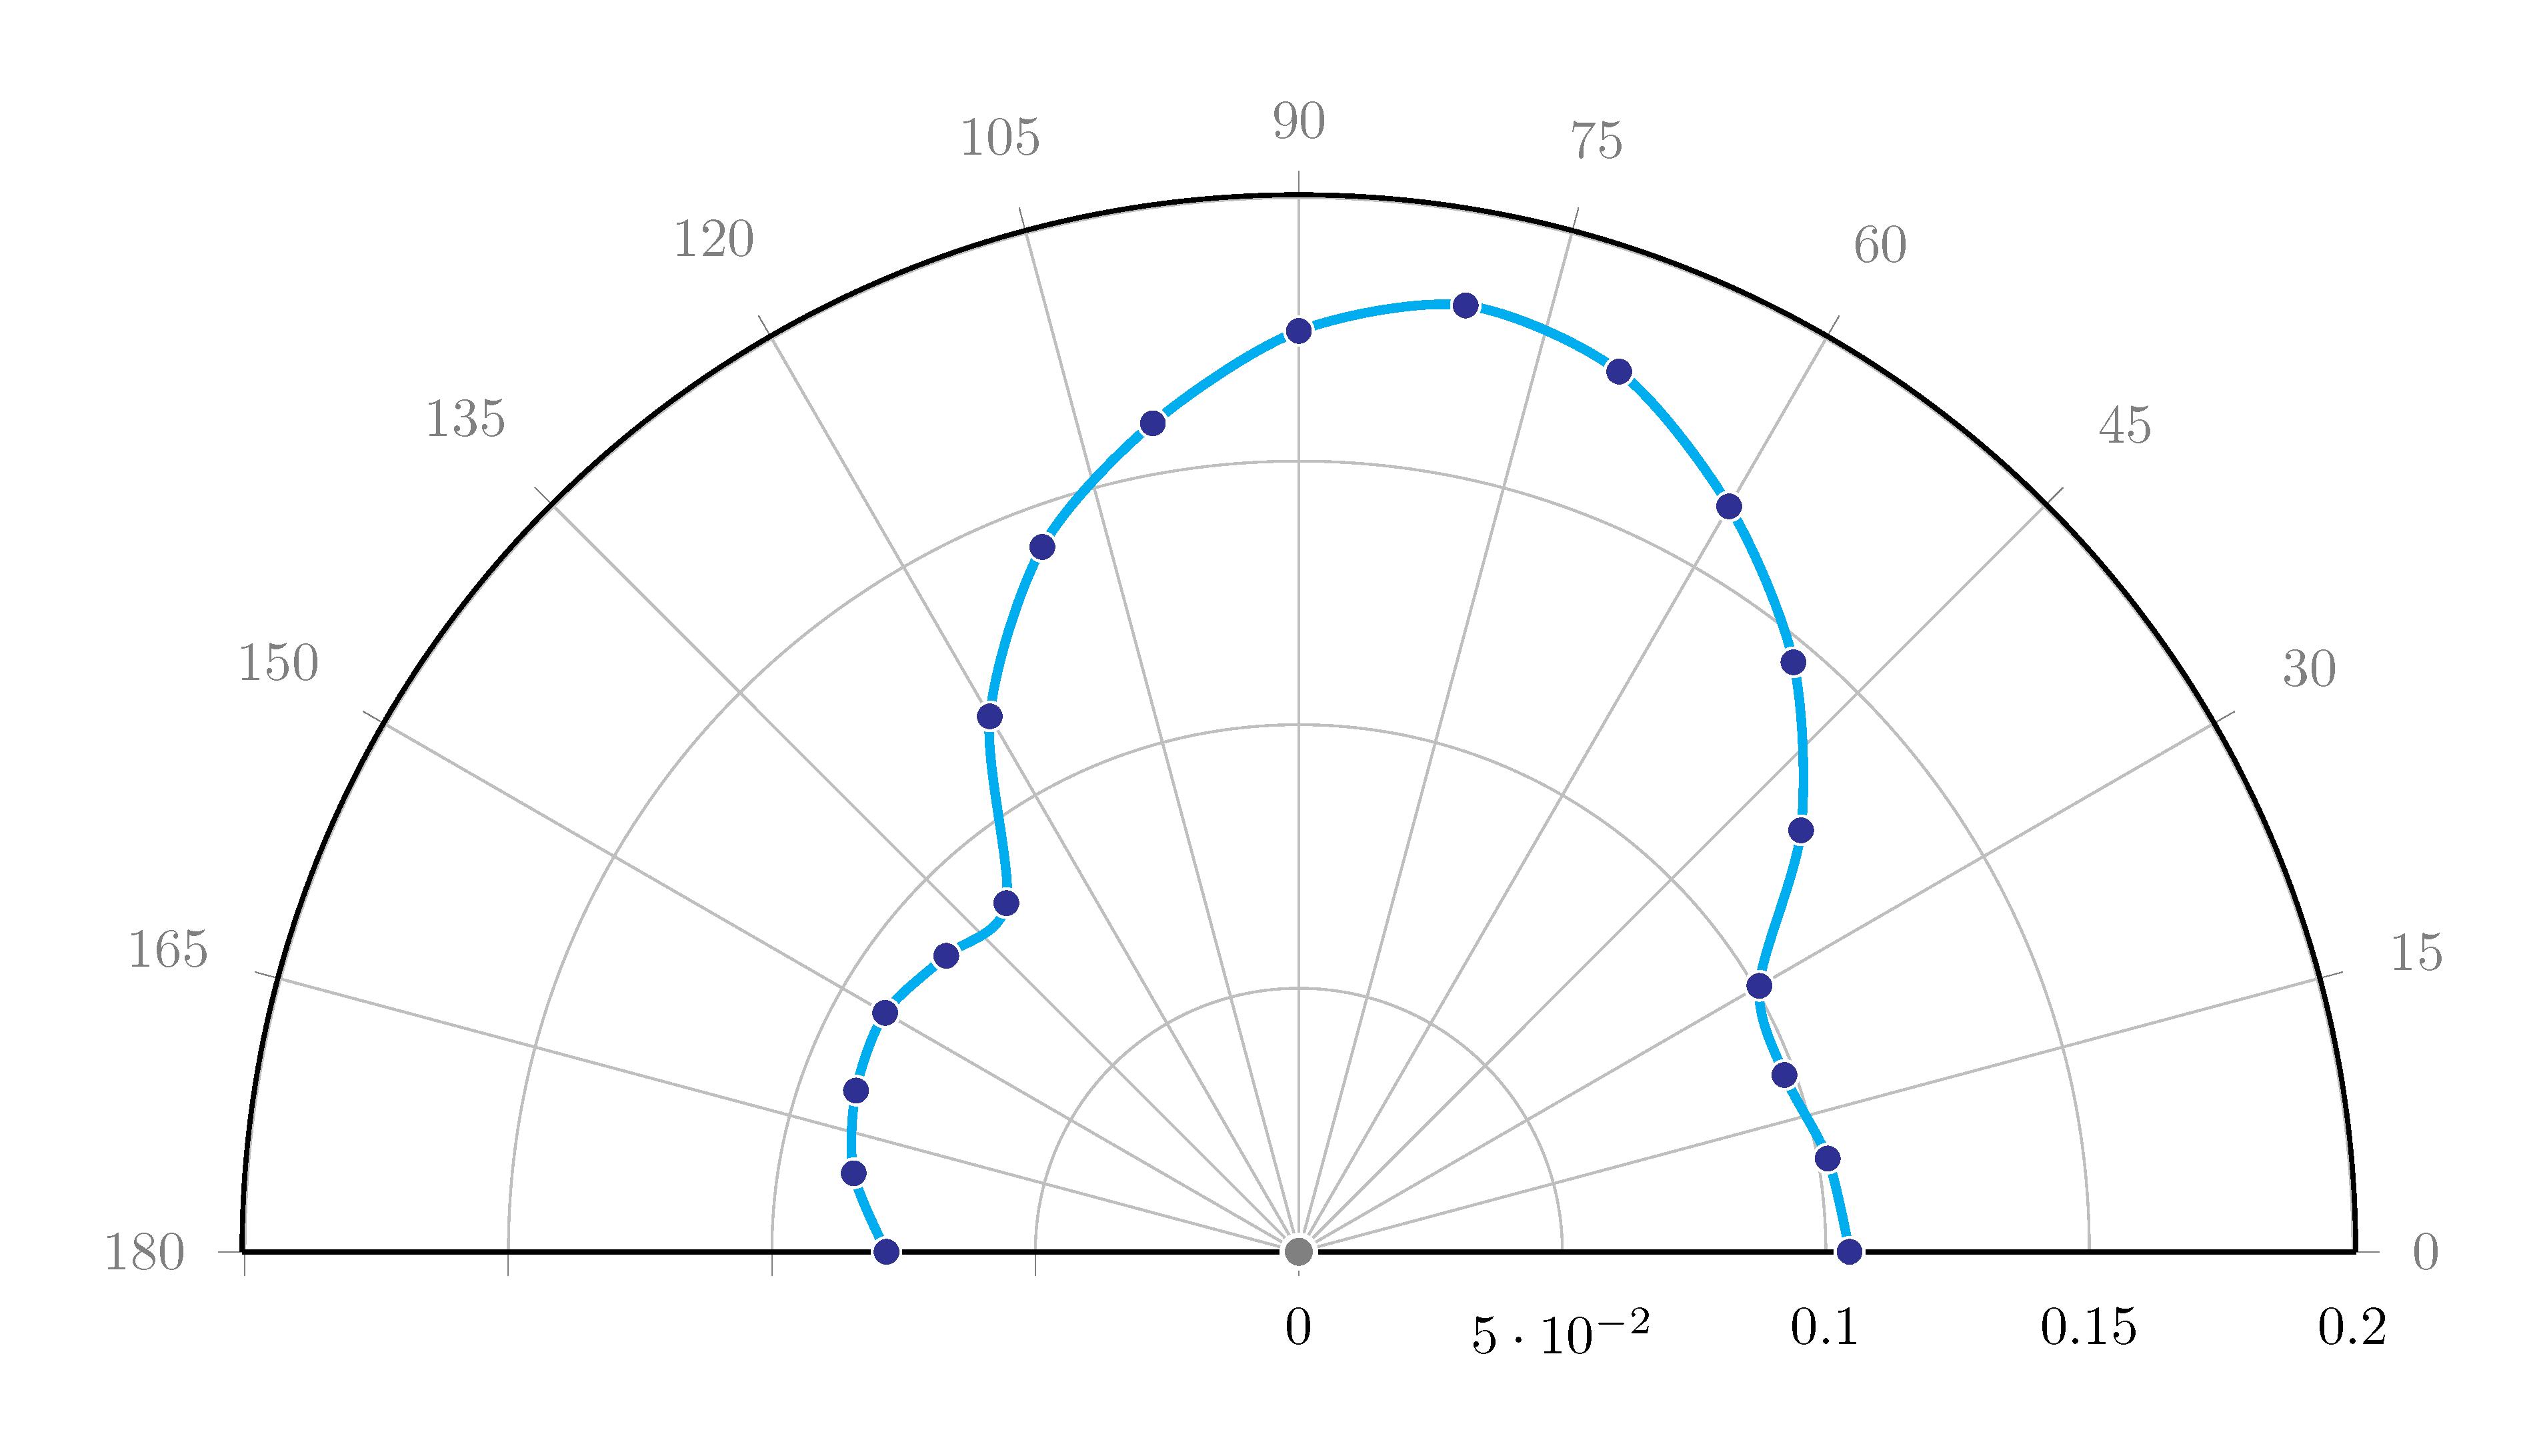 http://forum.matematika.cz/upload3/img/2018-02/63277_polar.png